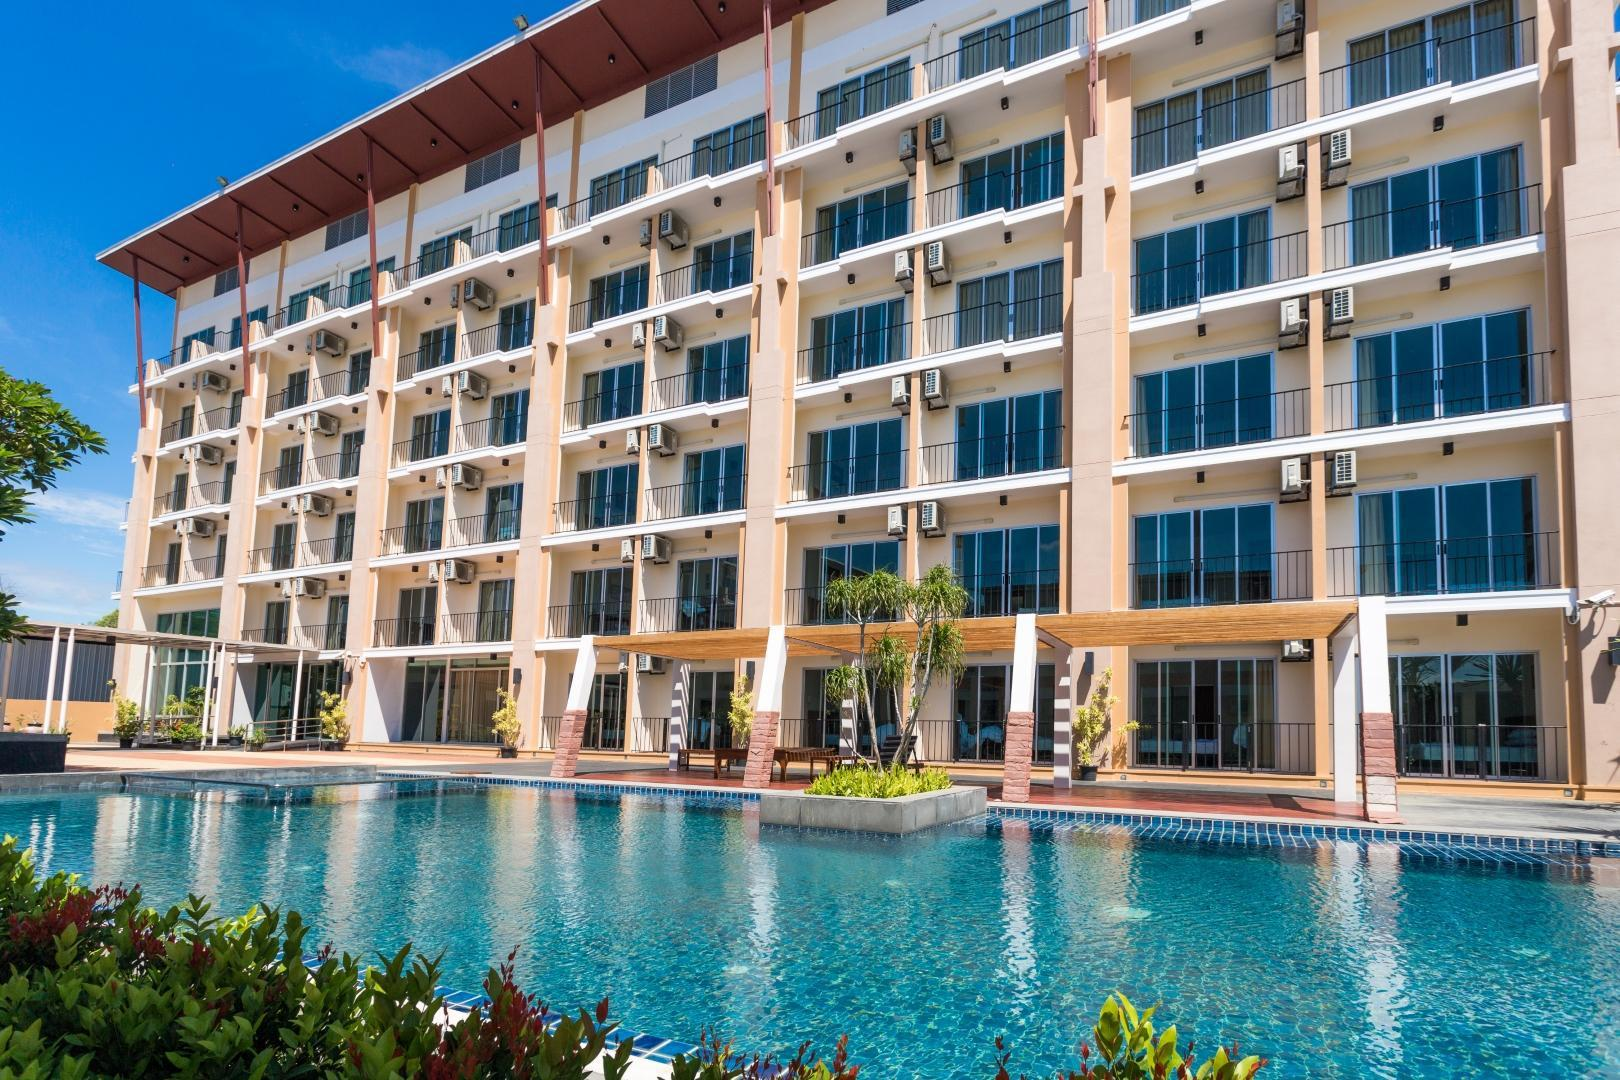 Kanokan Hotel โรงแรมกนกกาญจน์